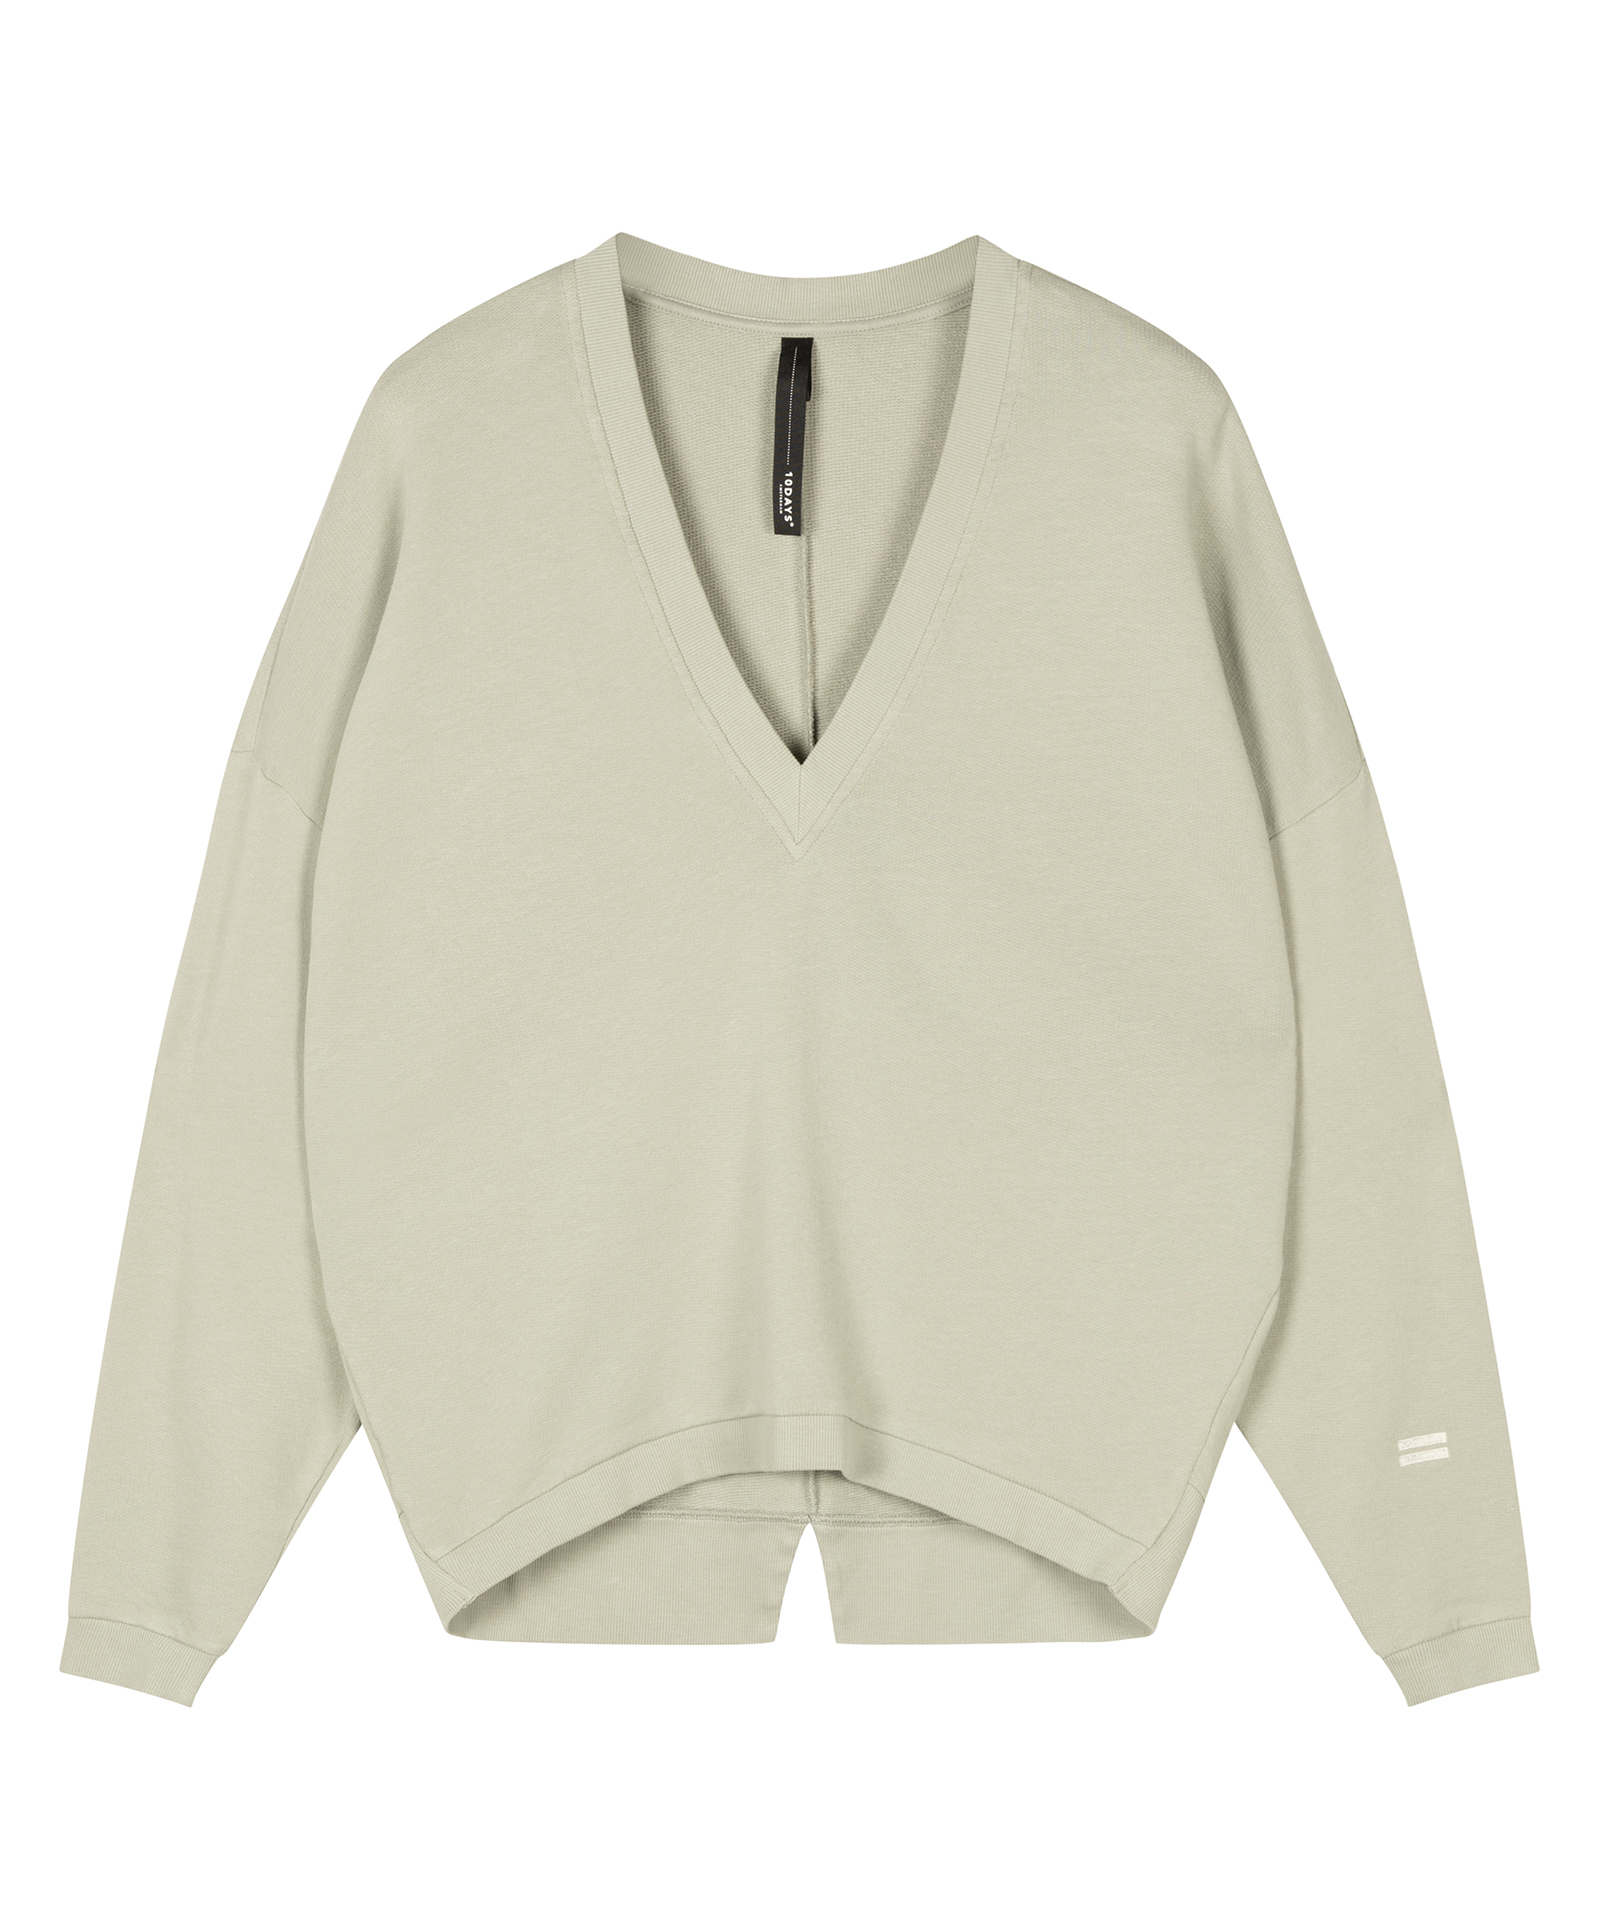 V-neck Sweater - Pistache